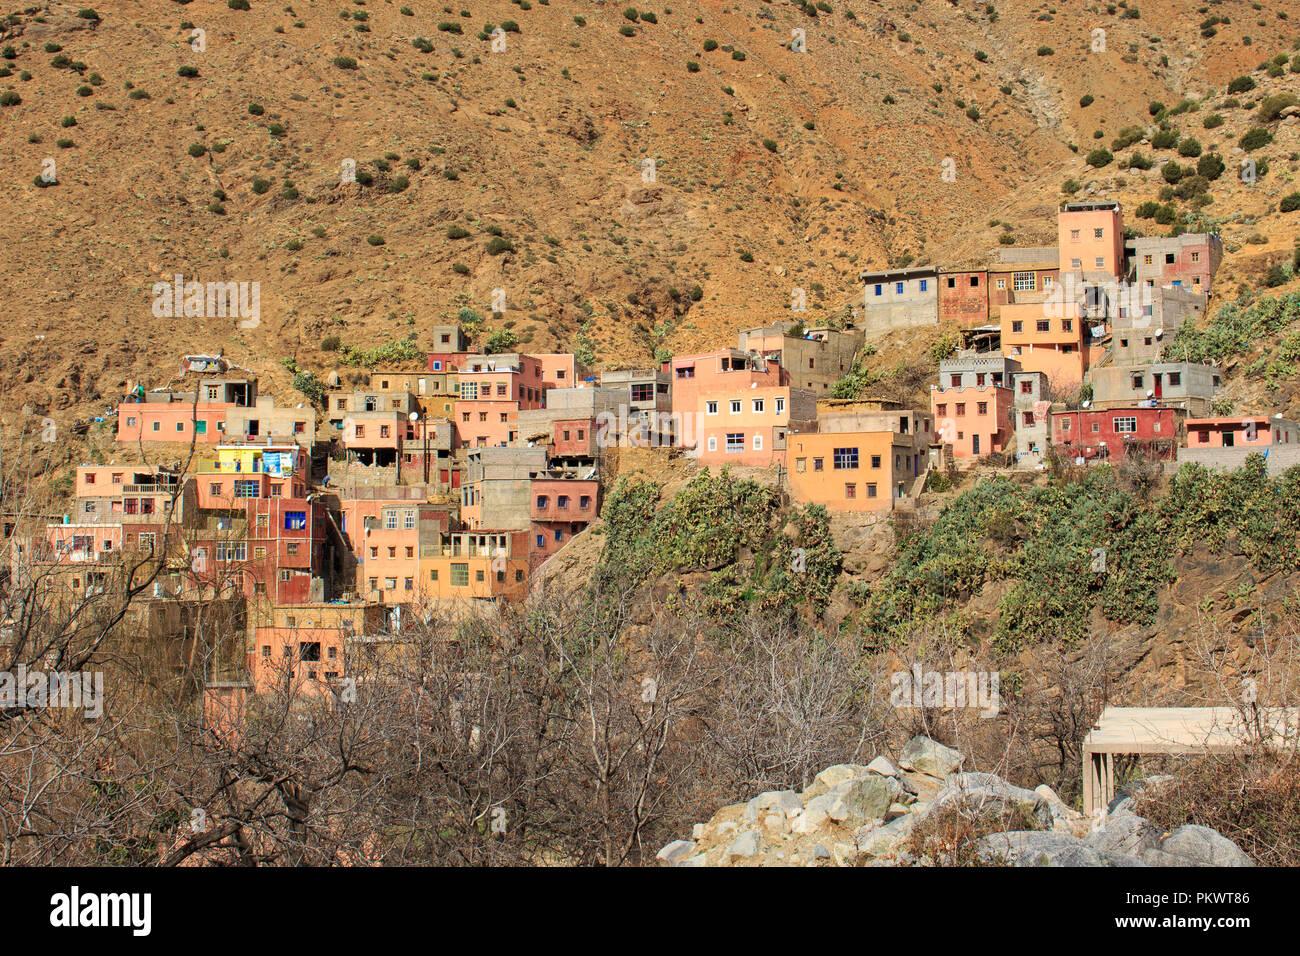 Panoramic View of Setti Fatma - Morocco Stock Photo